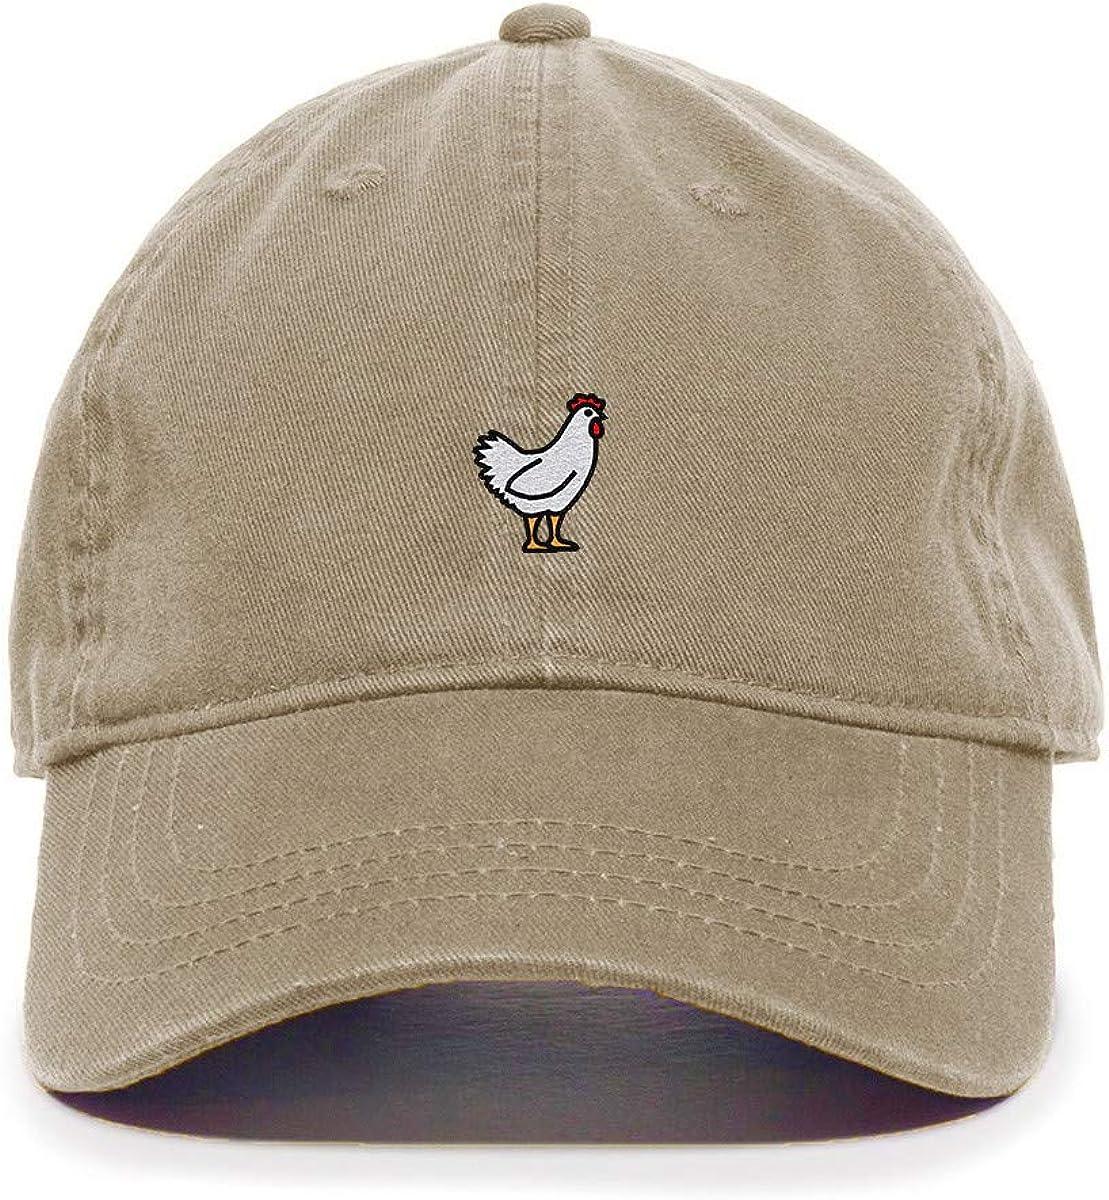 Tech Design Chicken Baseball Cap Embroidered Cotton Adjustable Dad Hat